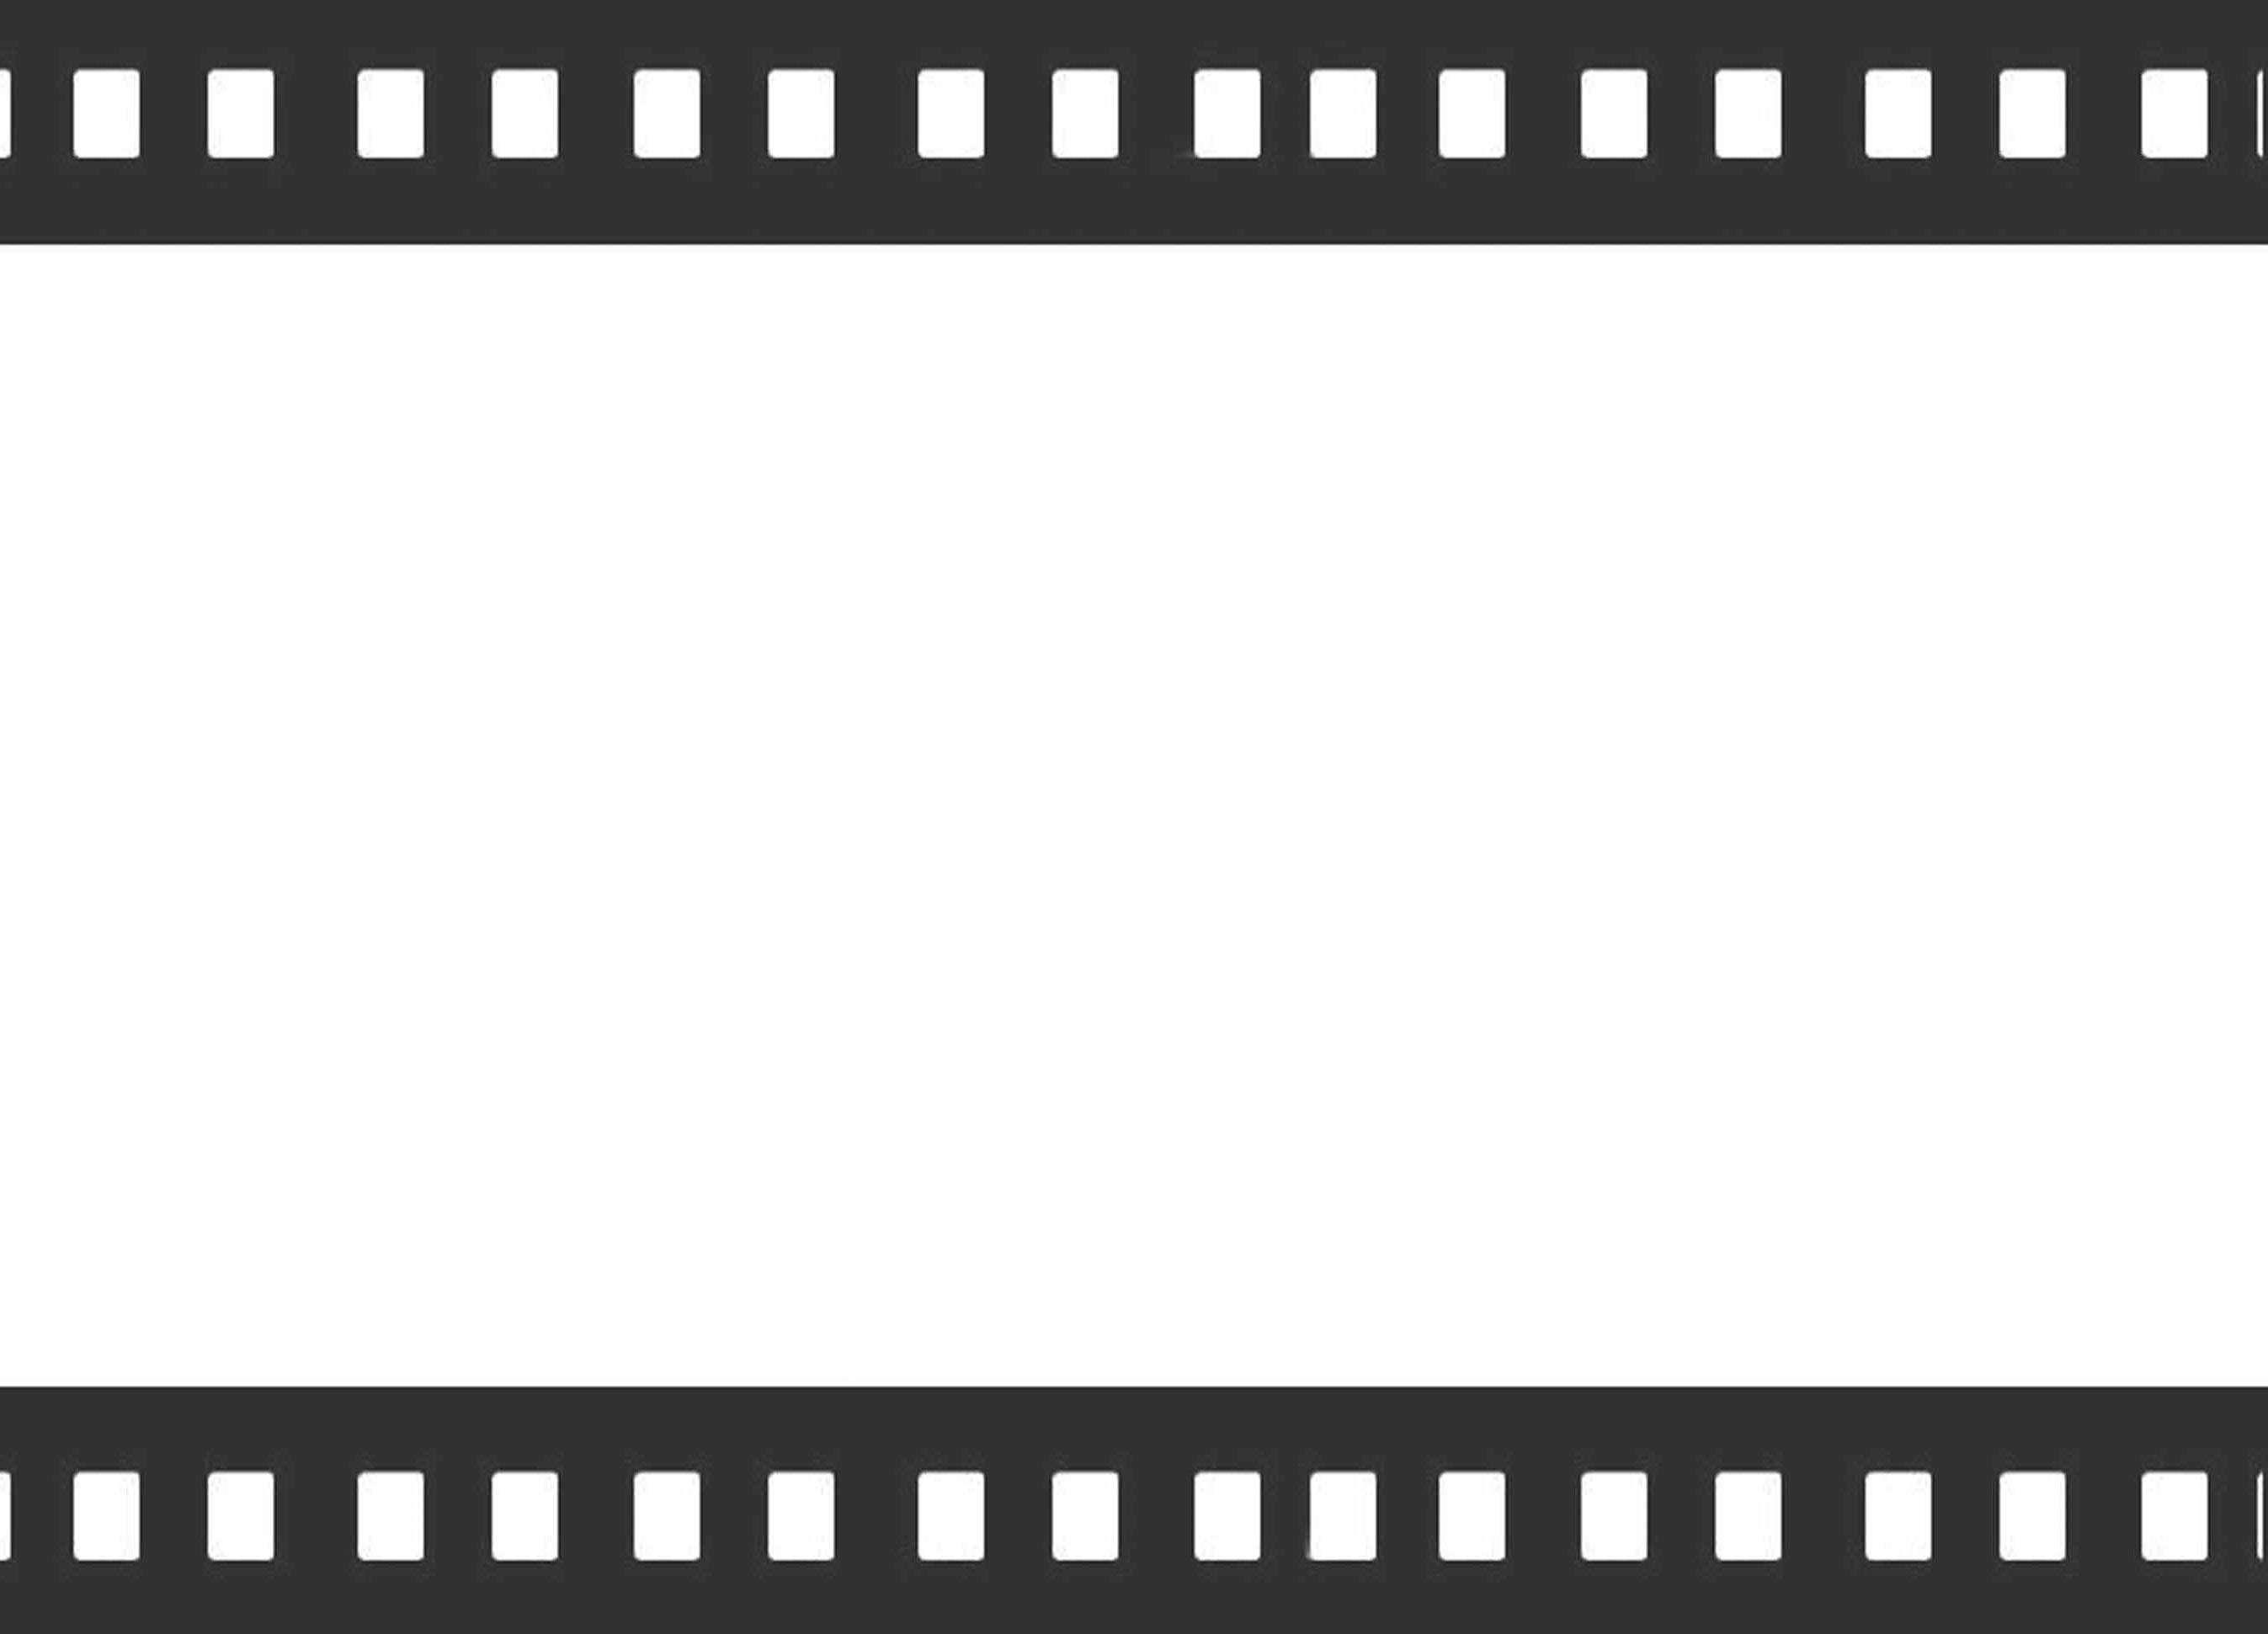 filmbackground